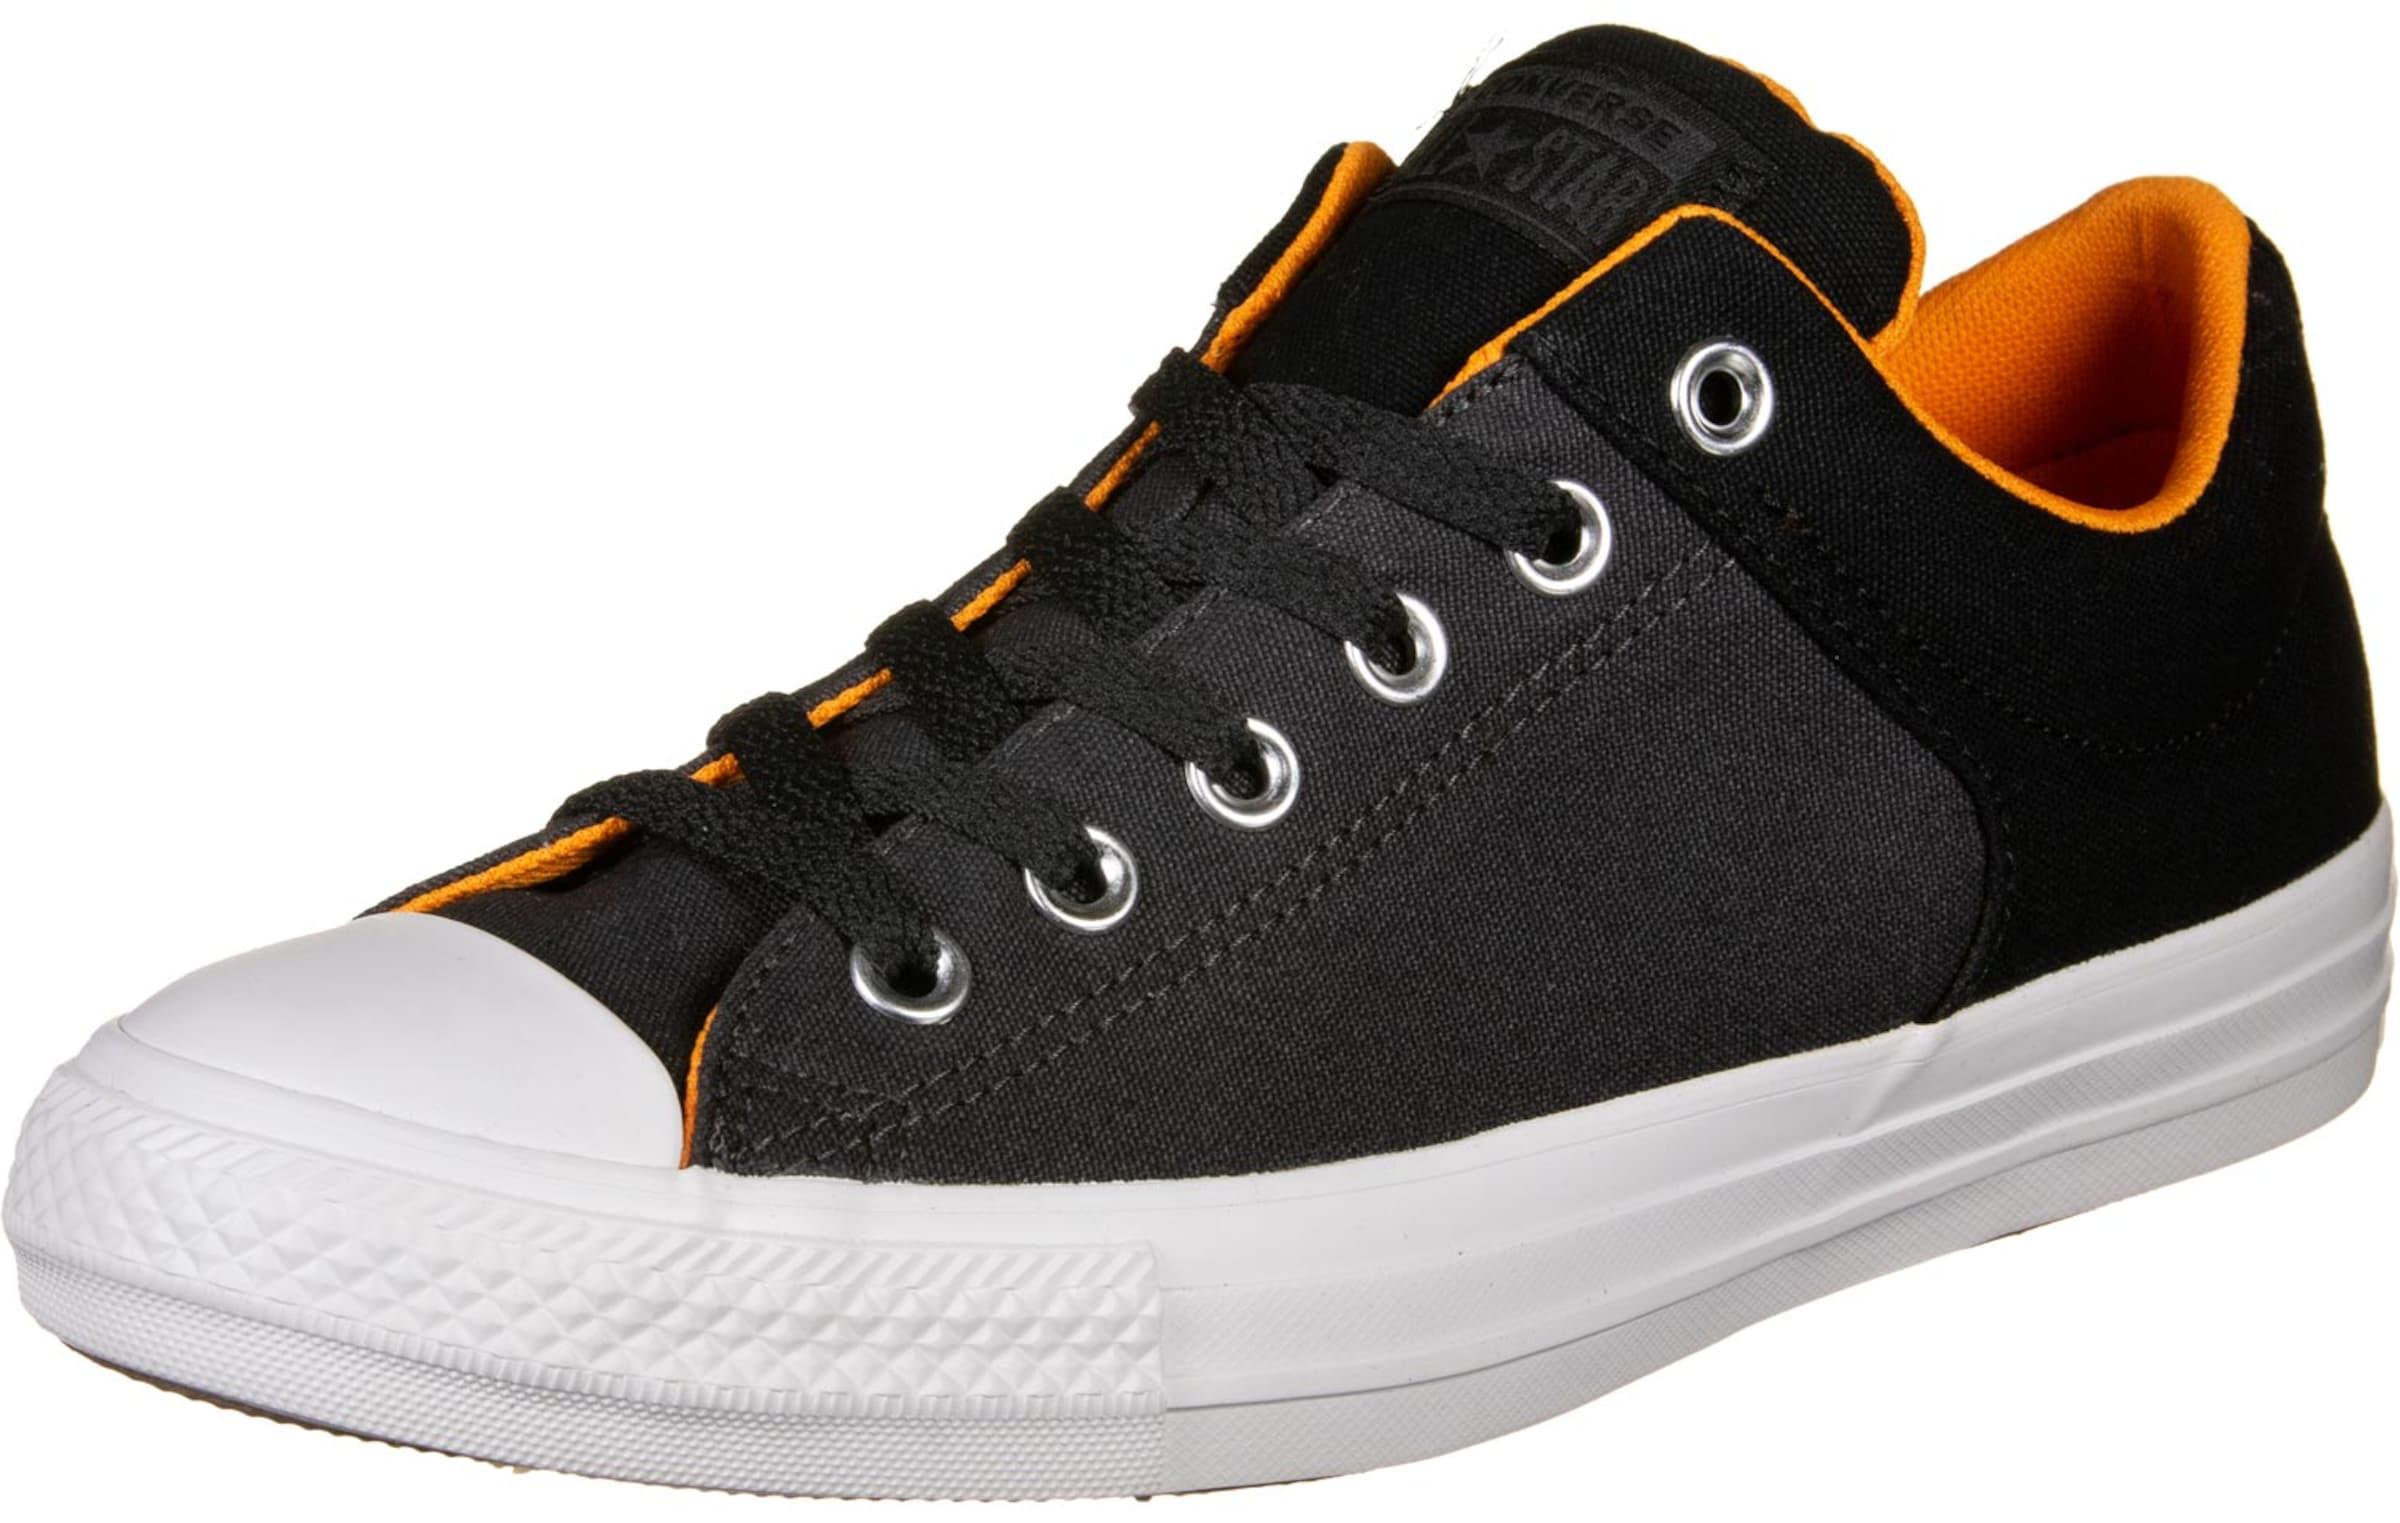 Star High 'all In Street Converse Ox' OrangeSchwarz Weiß Sneaker sQrdht